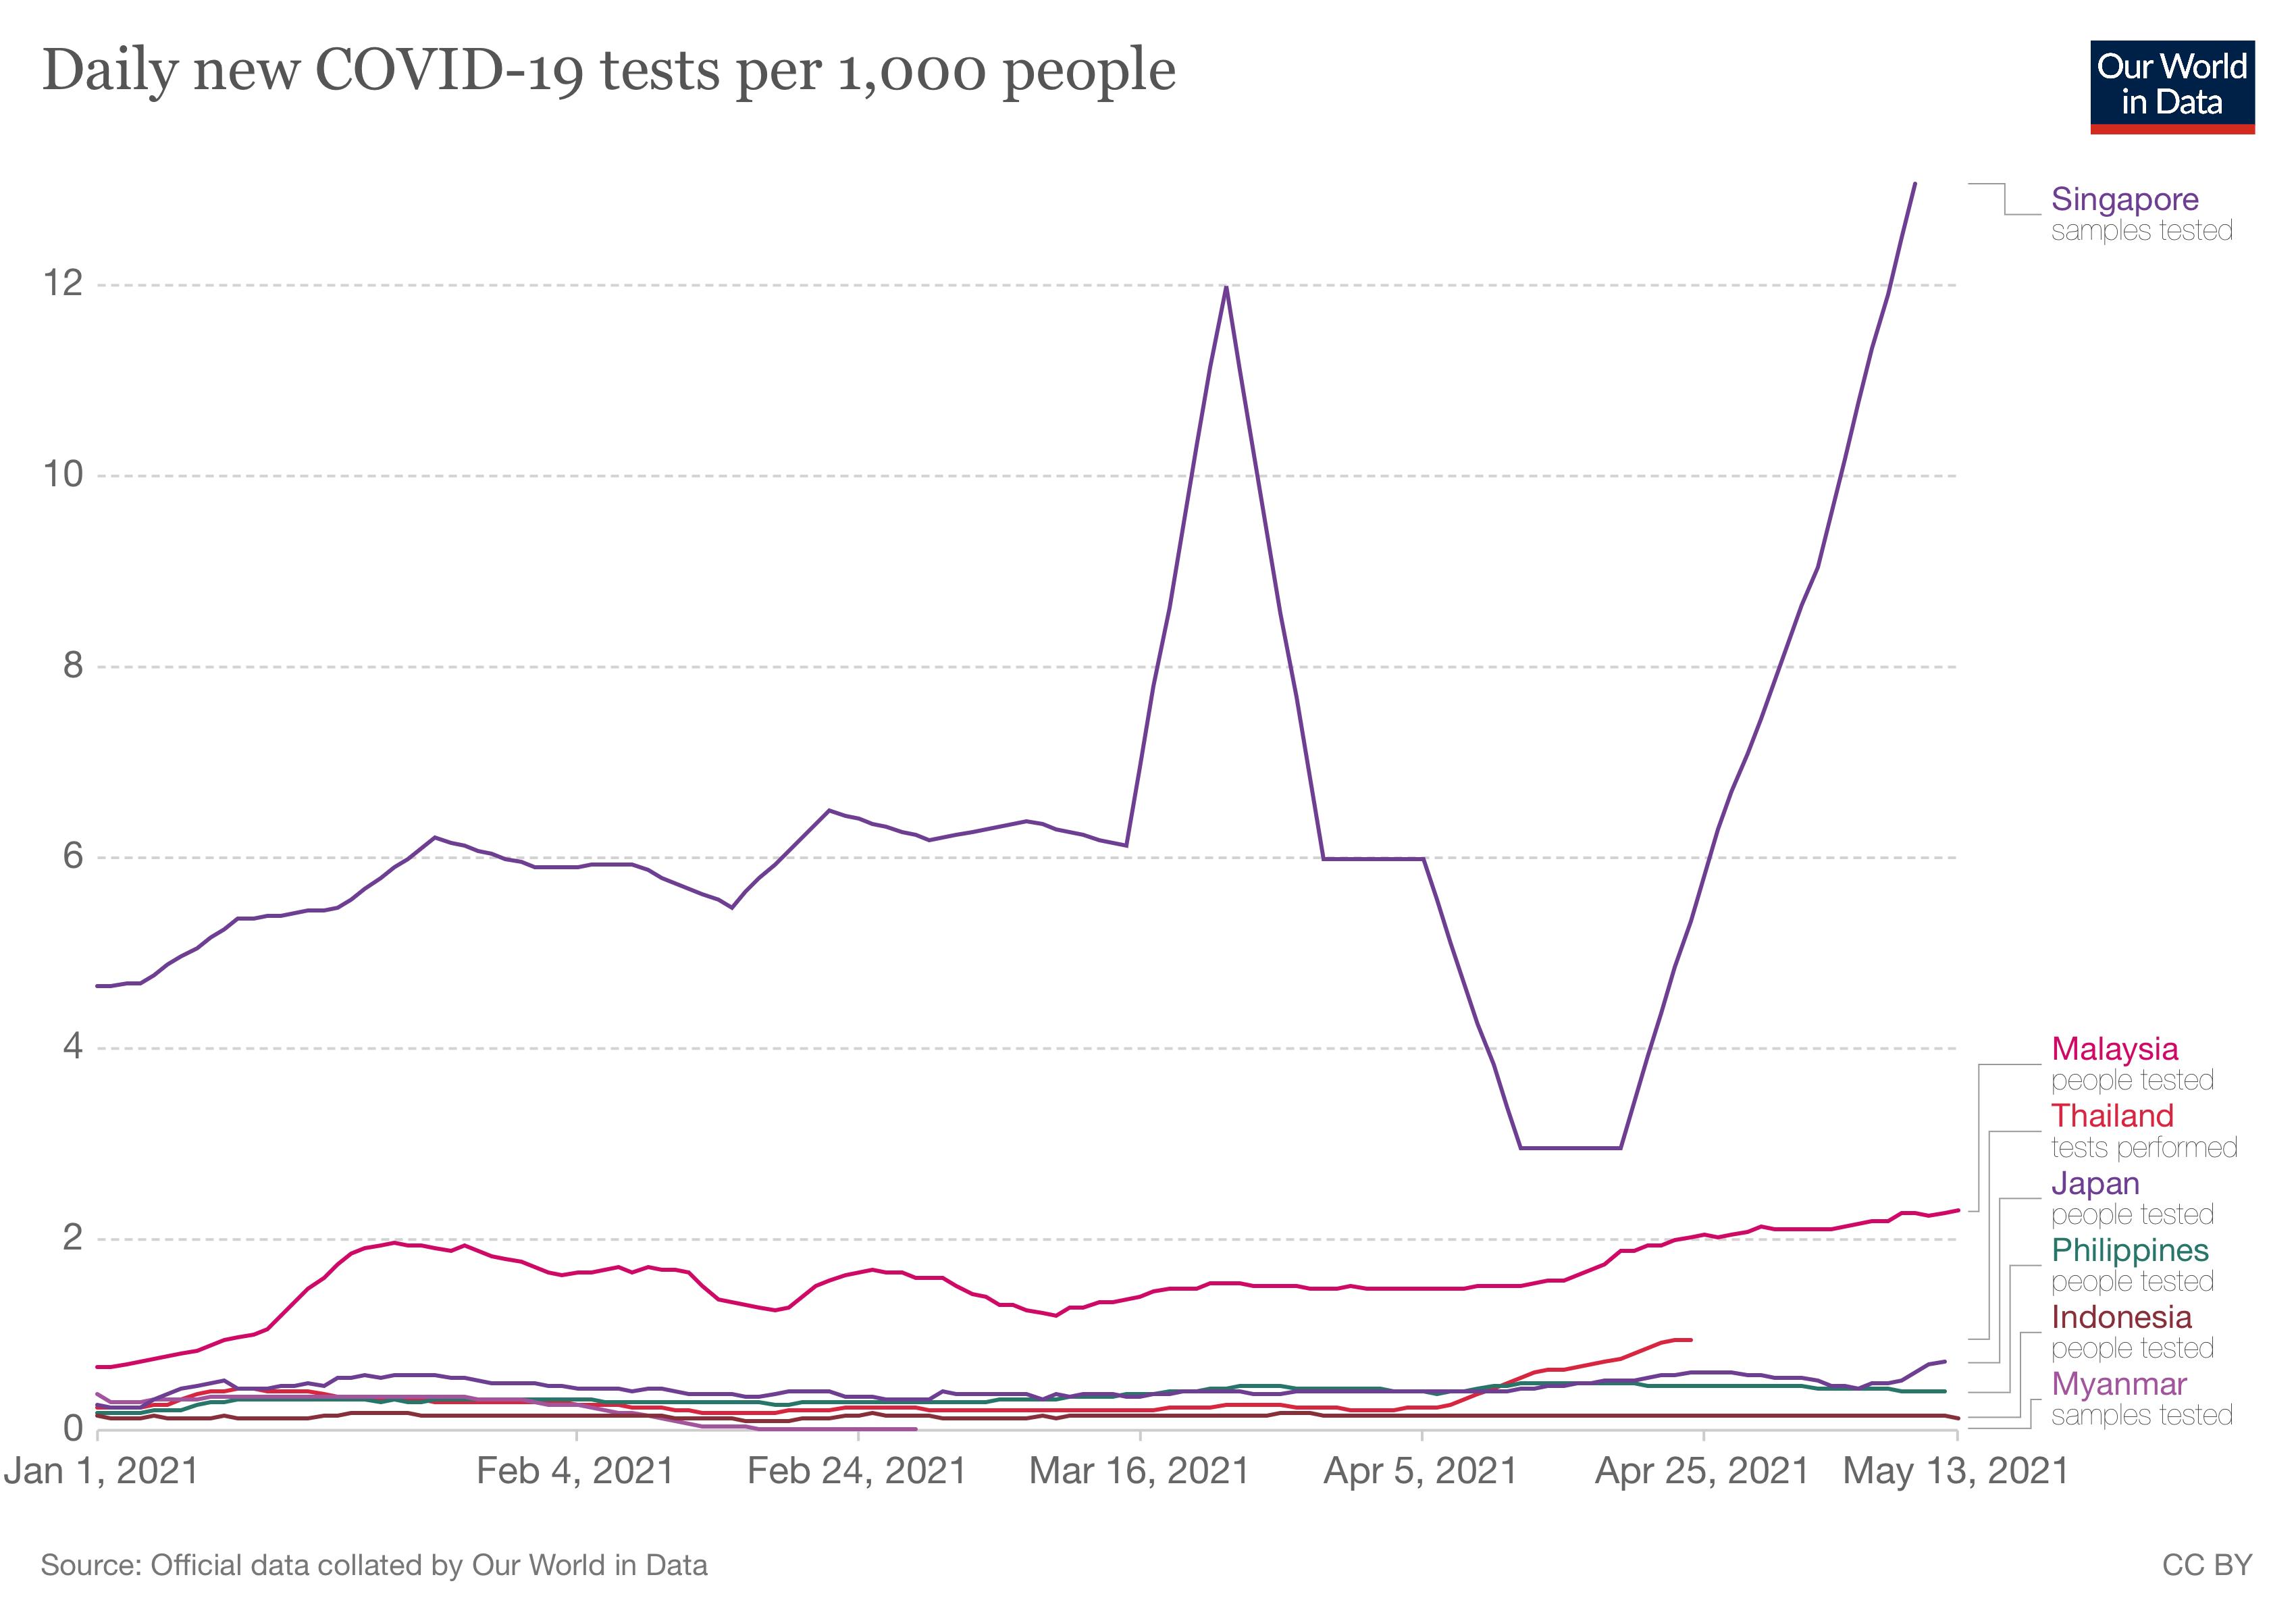 coronavirus-data-explorer-6 test